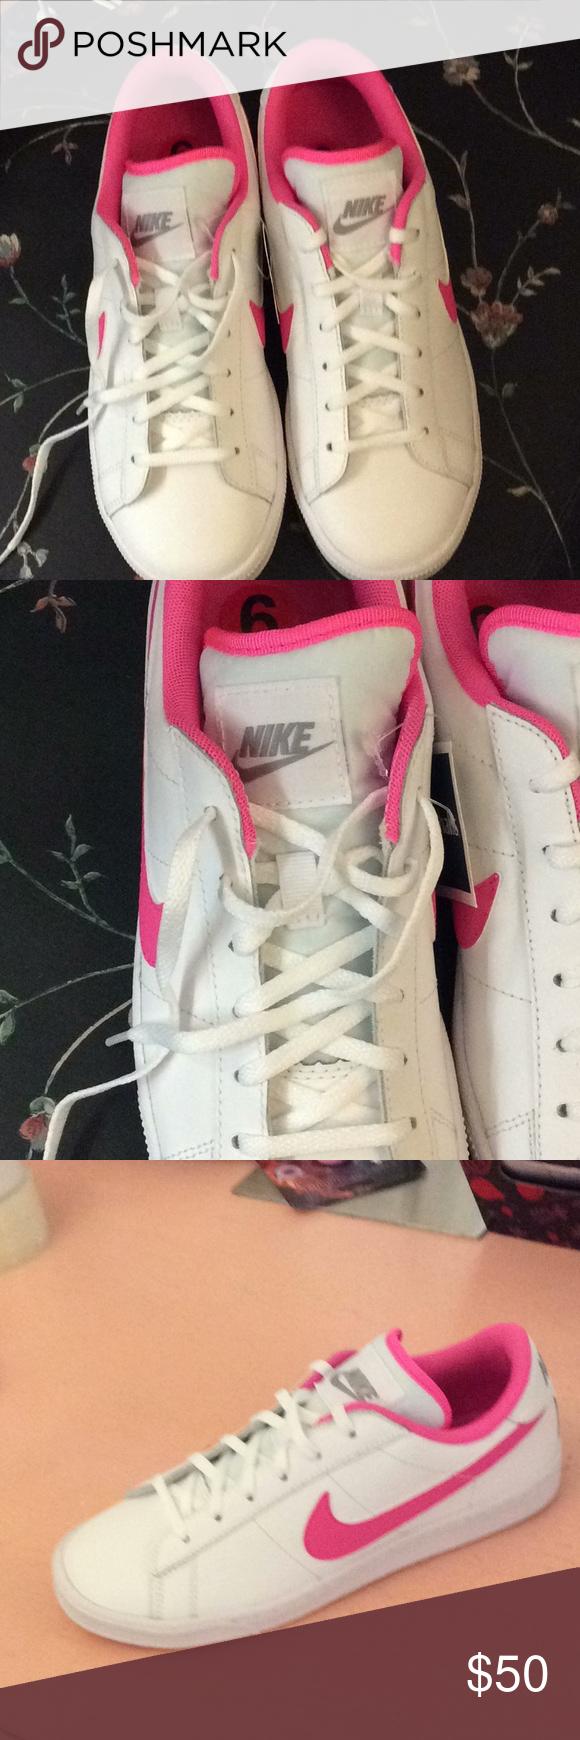 Nike NWOT Sneakers Brand new Nike hot pink & white sneakers. Nike Shoes Sneakers